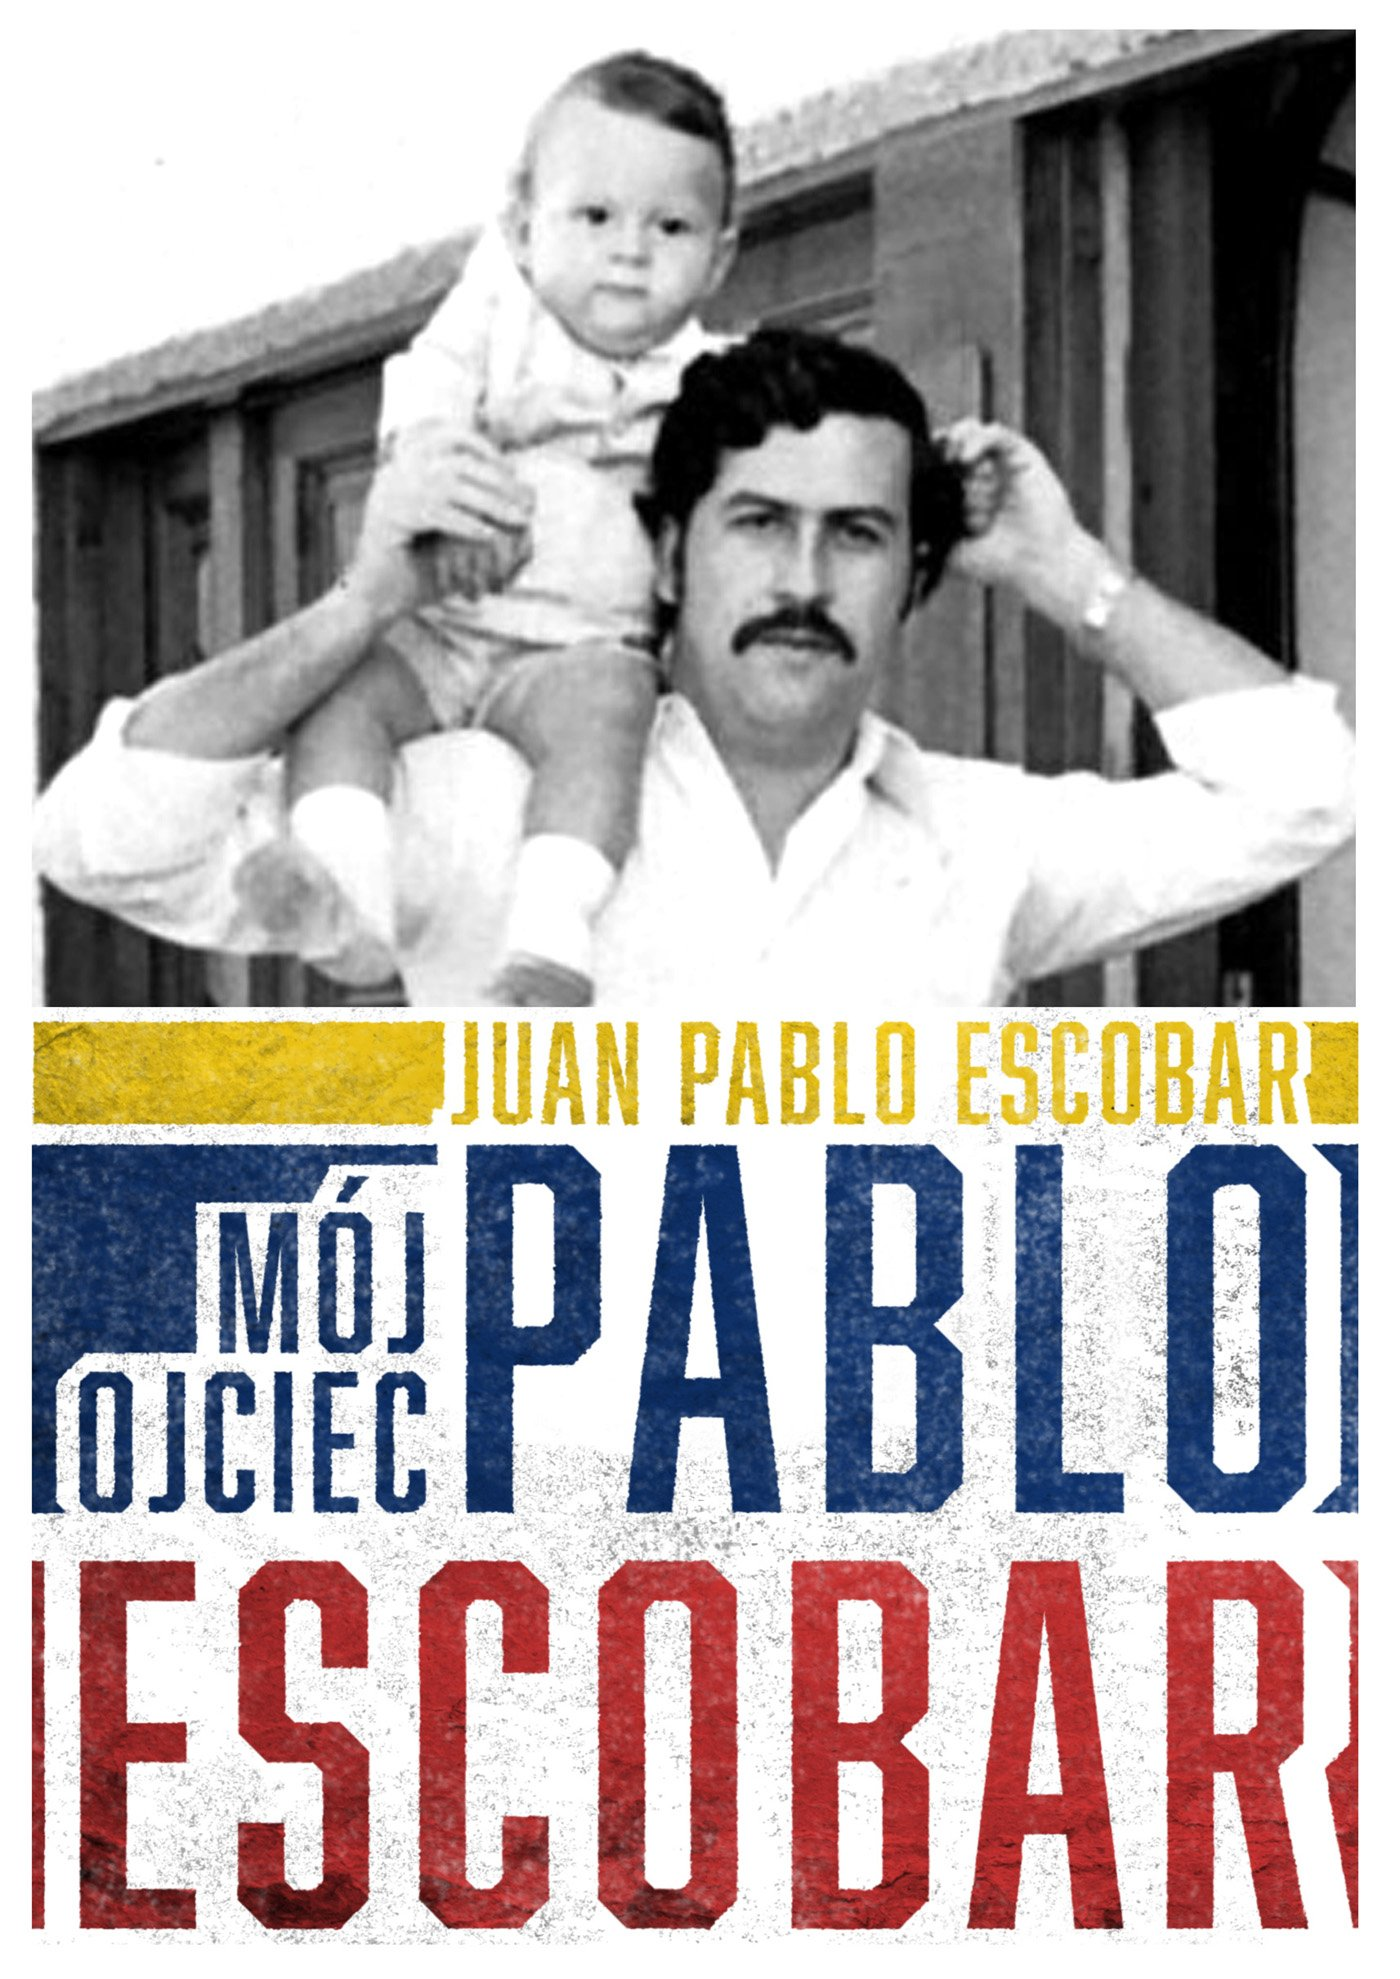 Mój ojciec Pablo Escobar - Ebook (Książka EPUB) do pobrania w formacie EPUB